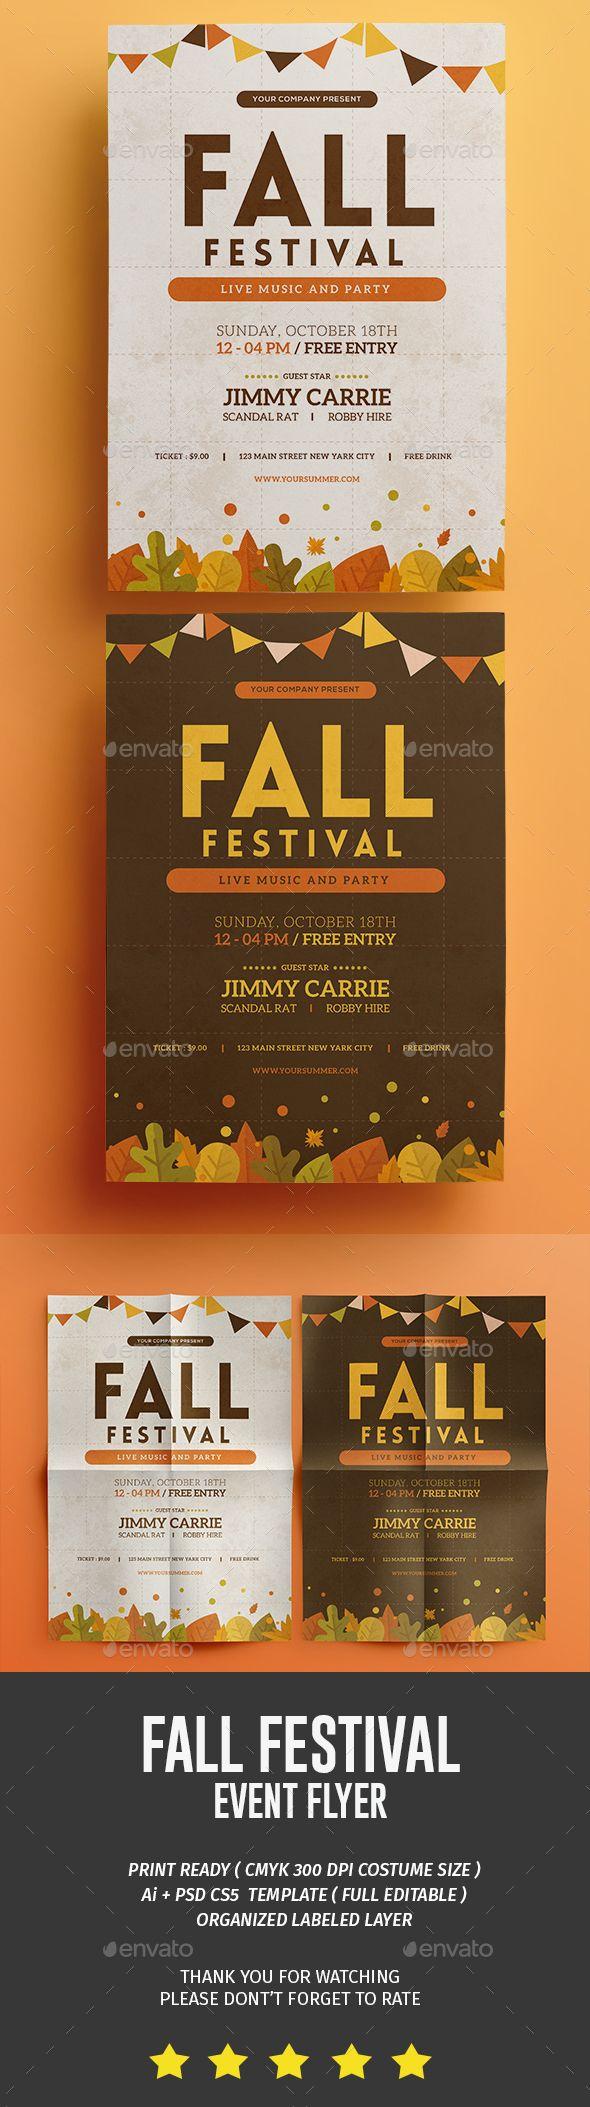 Fall Festival Flyer Template PSD, AI Illustrator